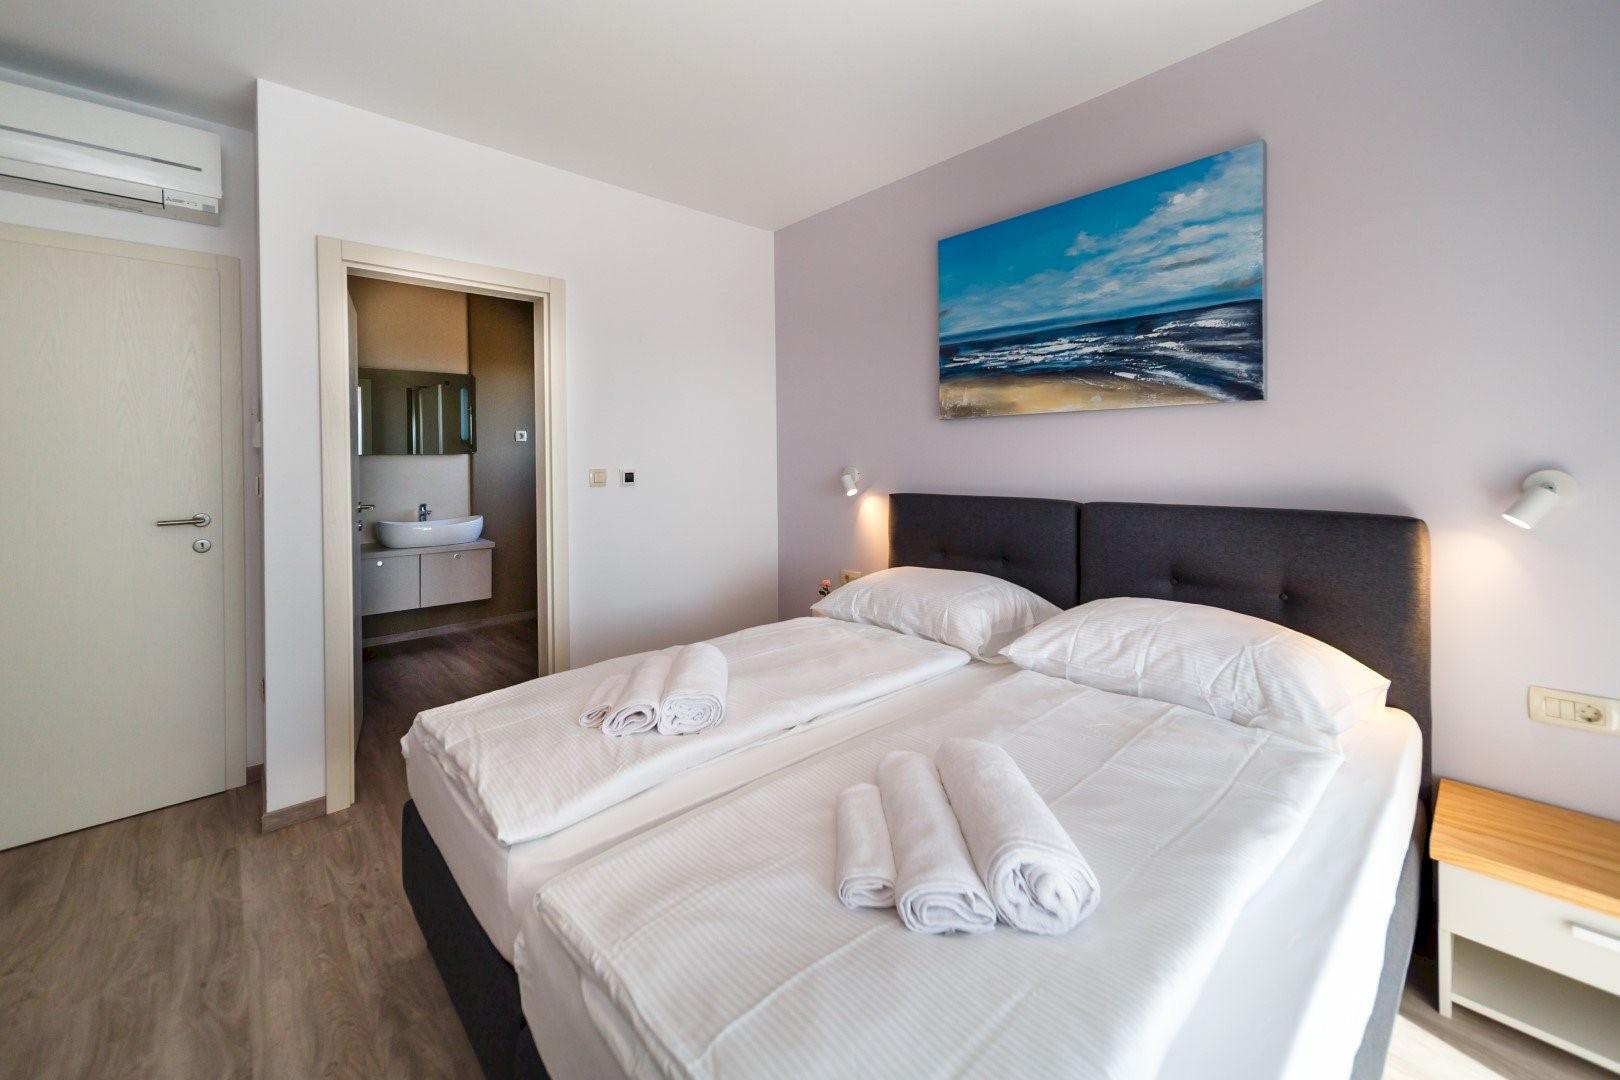 Ferienhaus Luxury Villa Loma 2 (2586643), Sveti Vid-Miholjice, Insel Krk, Kvarner, Kroatien, Bild 15